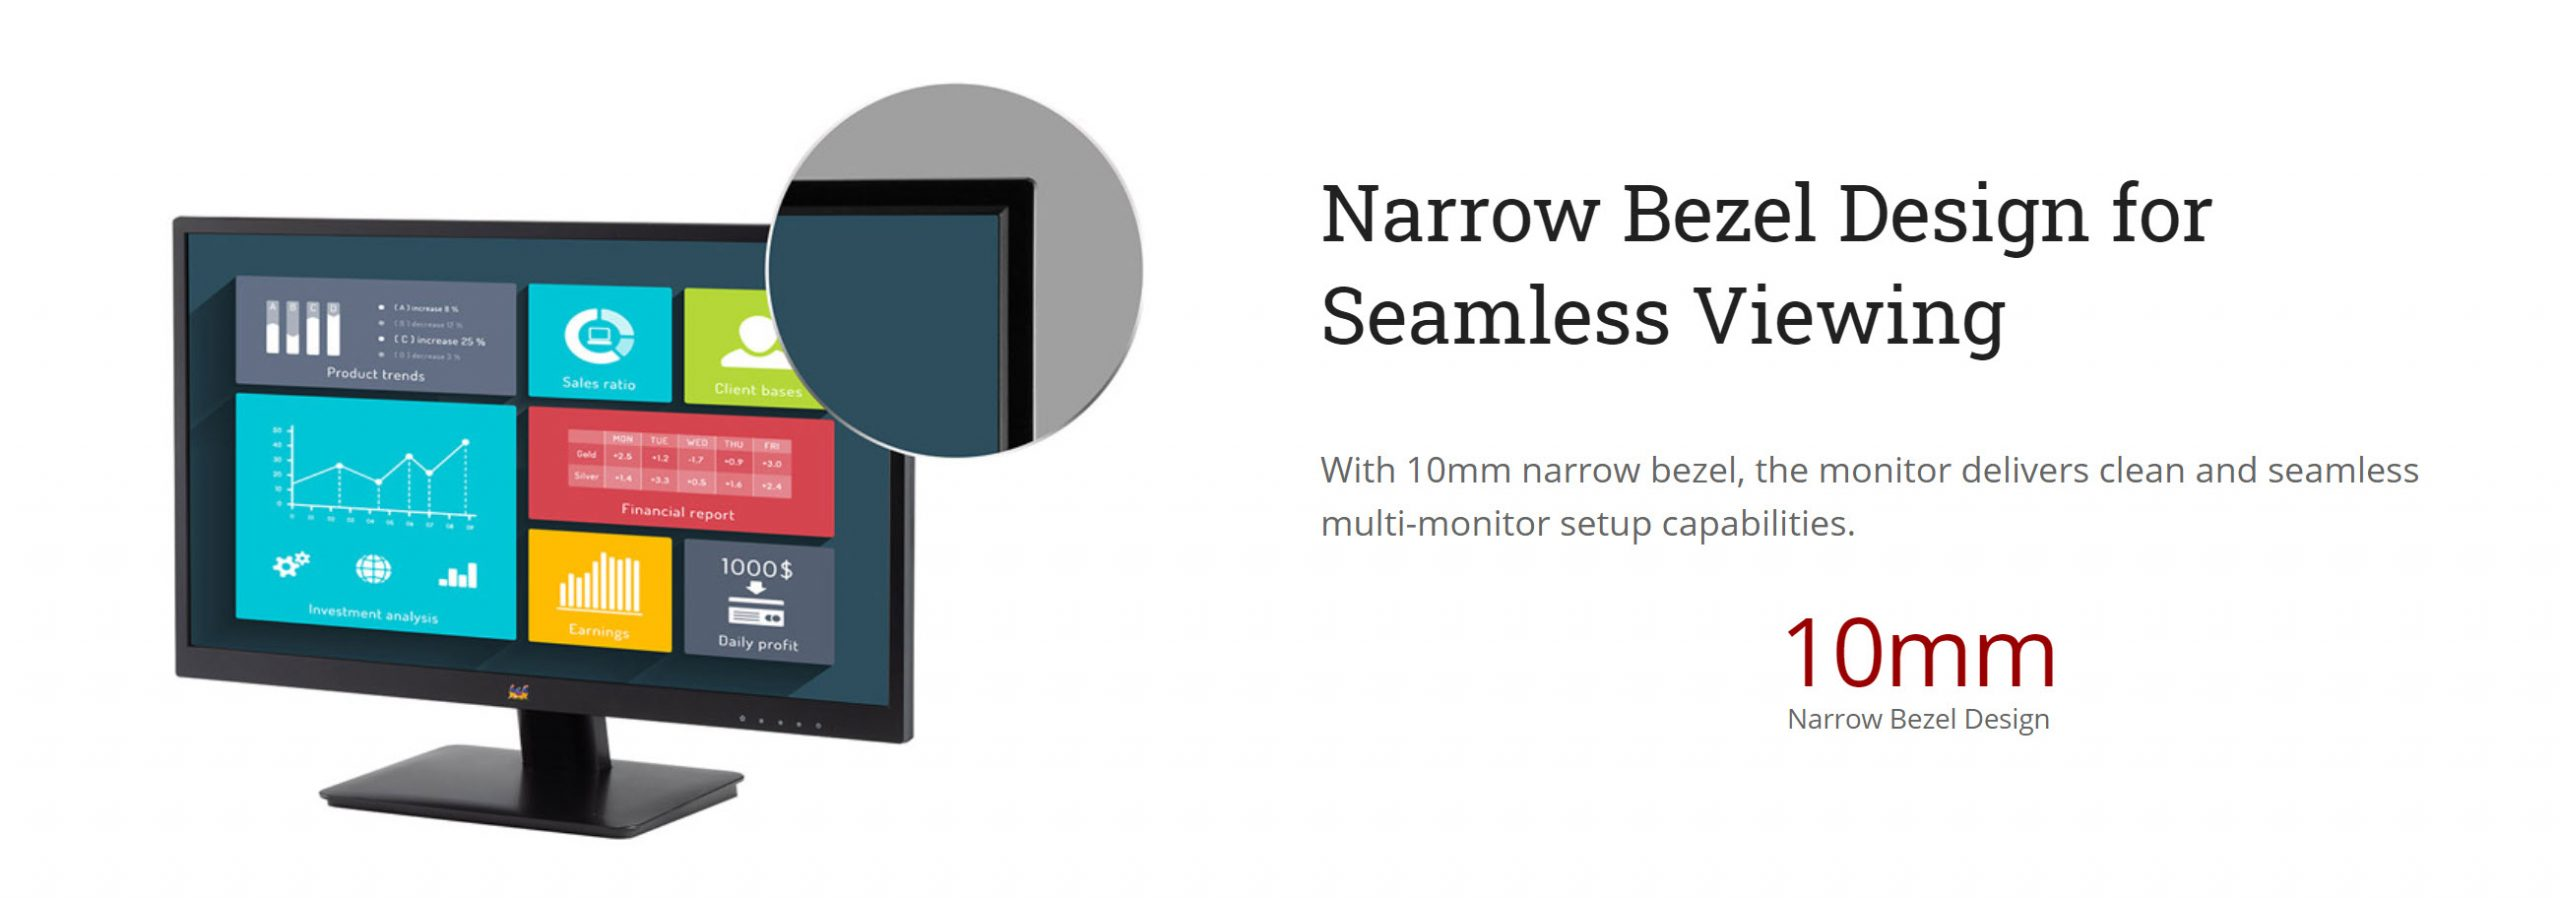 ViewSonic VA2410-mh, 24″ 1080p Home and Office Monitor, IPS, Narrow Bezel – New